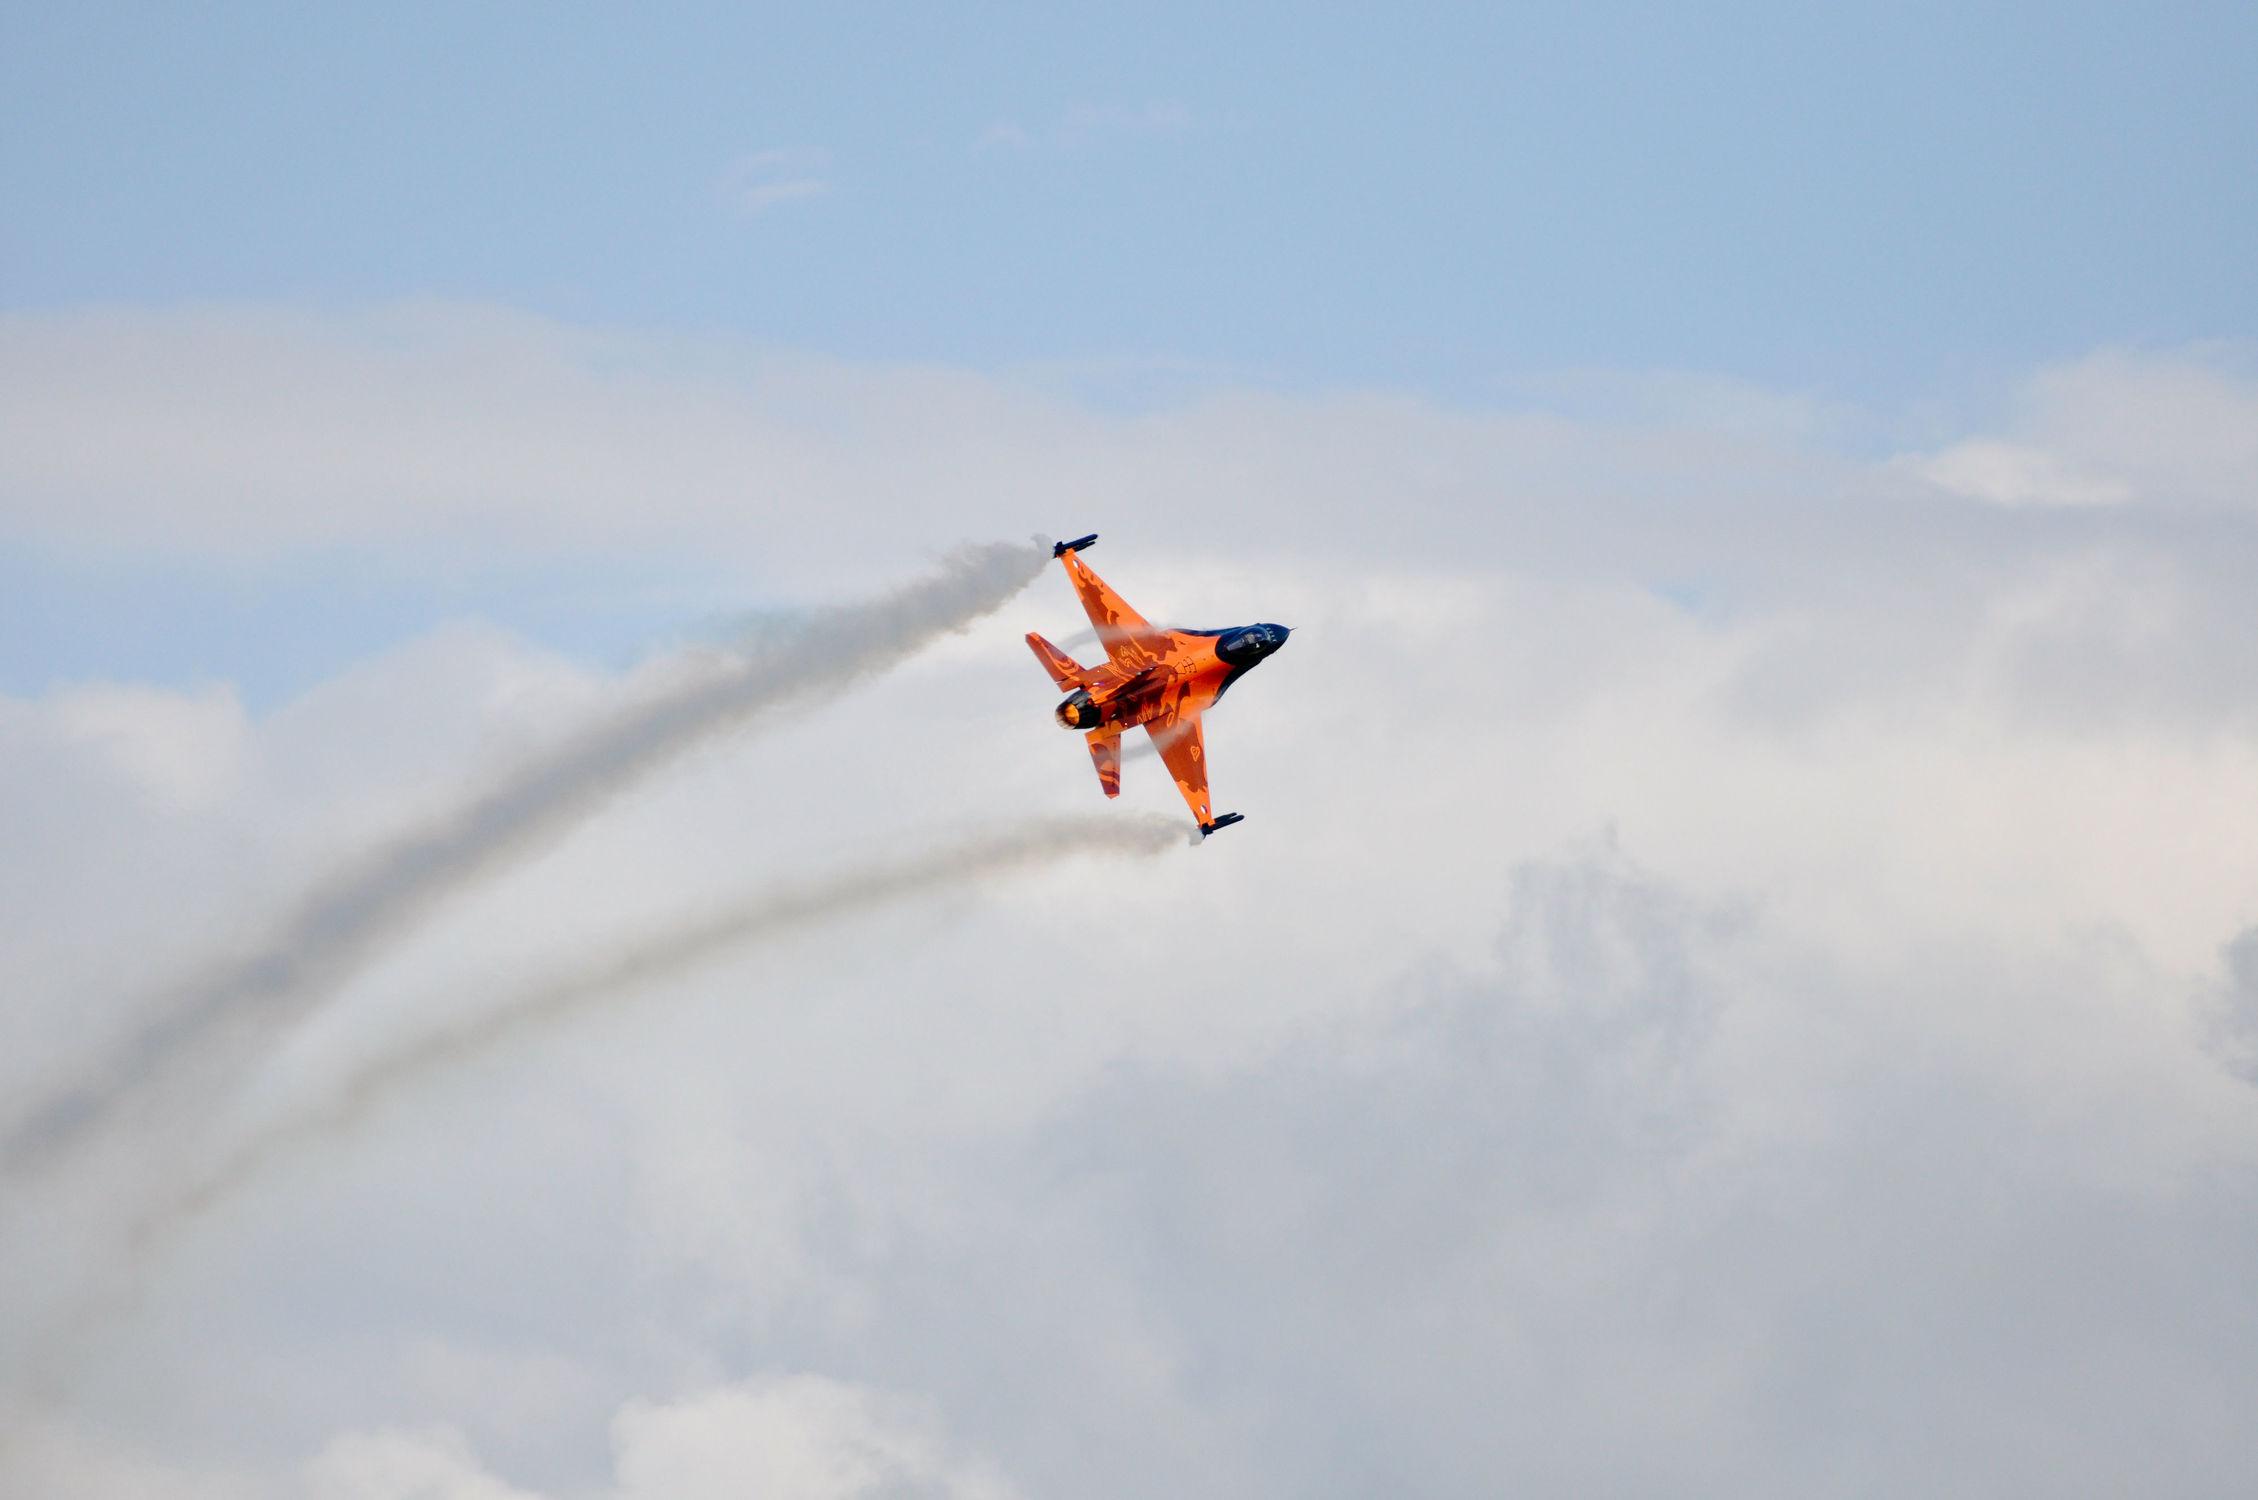 Bild mit Himmel, Wolkenhimmel, Wolkengebilde, Flugzeuge, Flugzeug, Jet, Jets, Flug